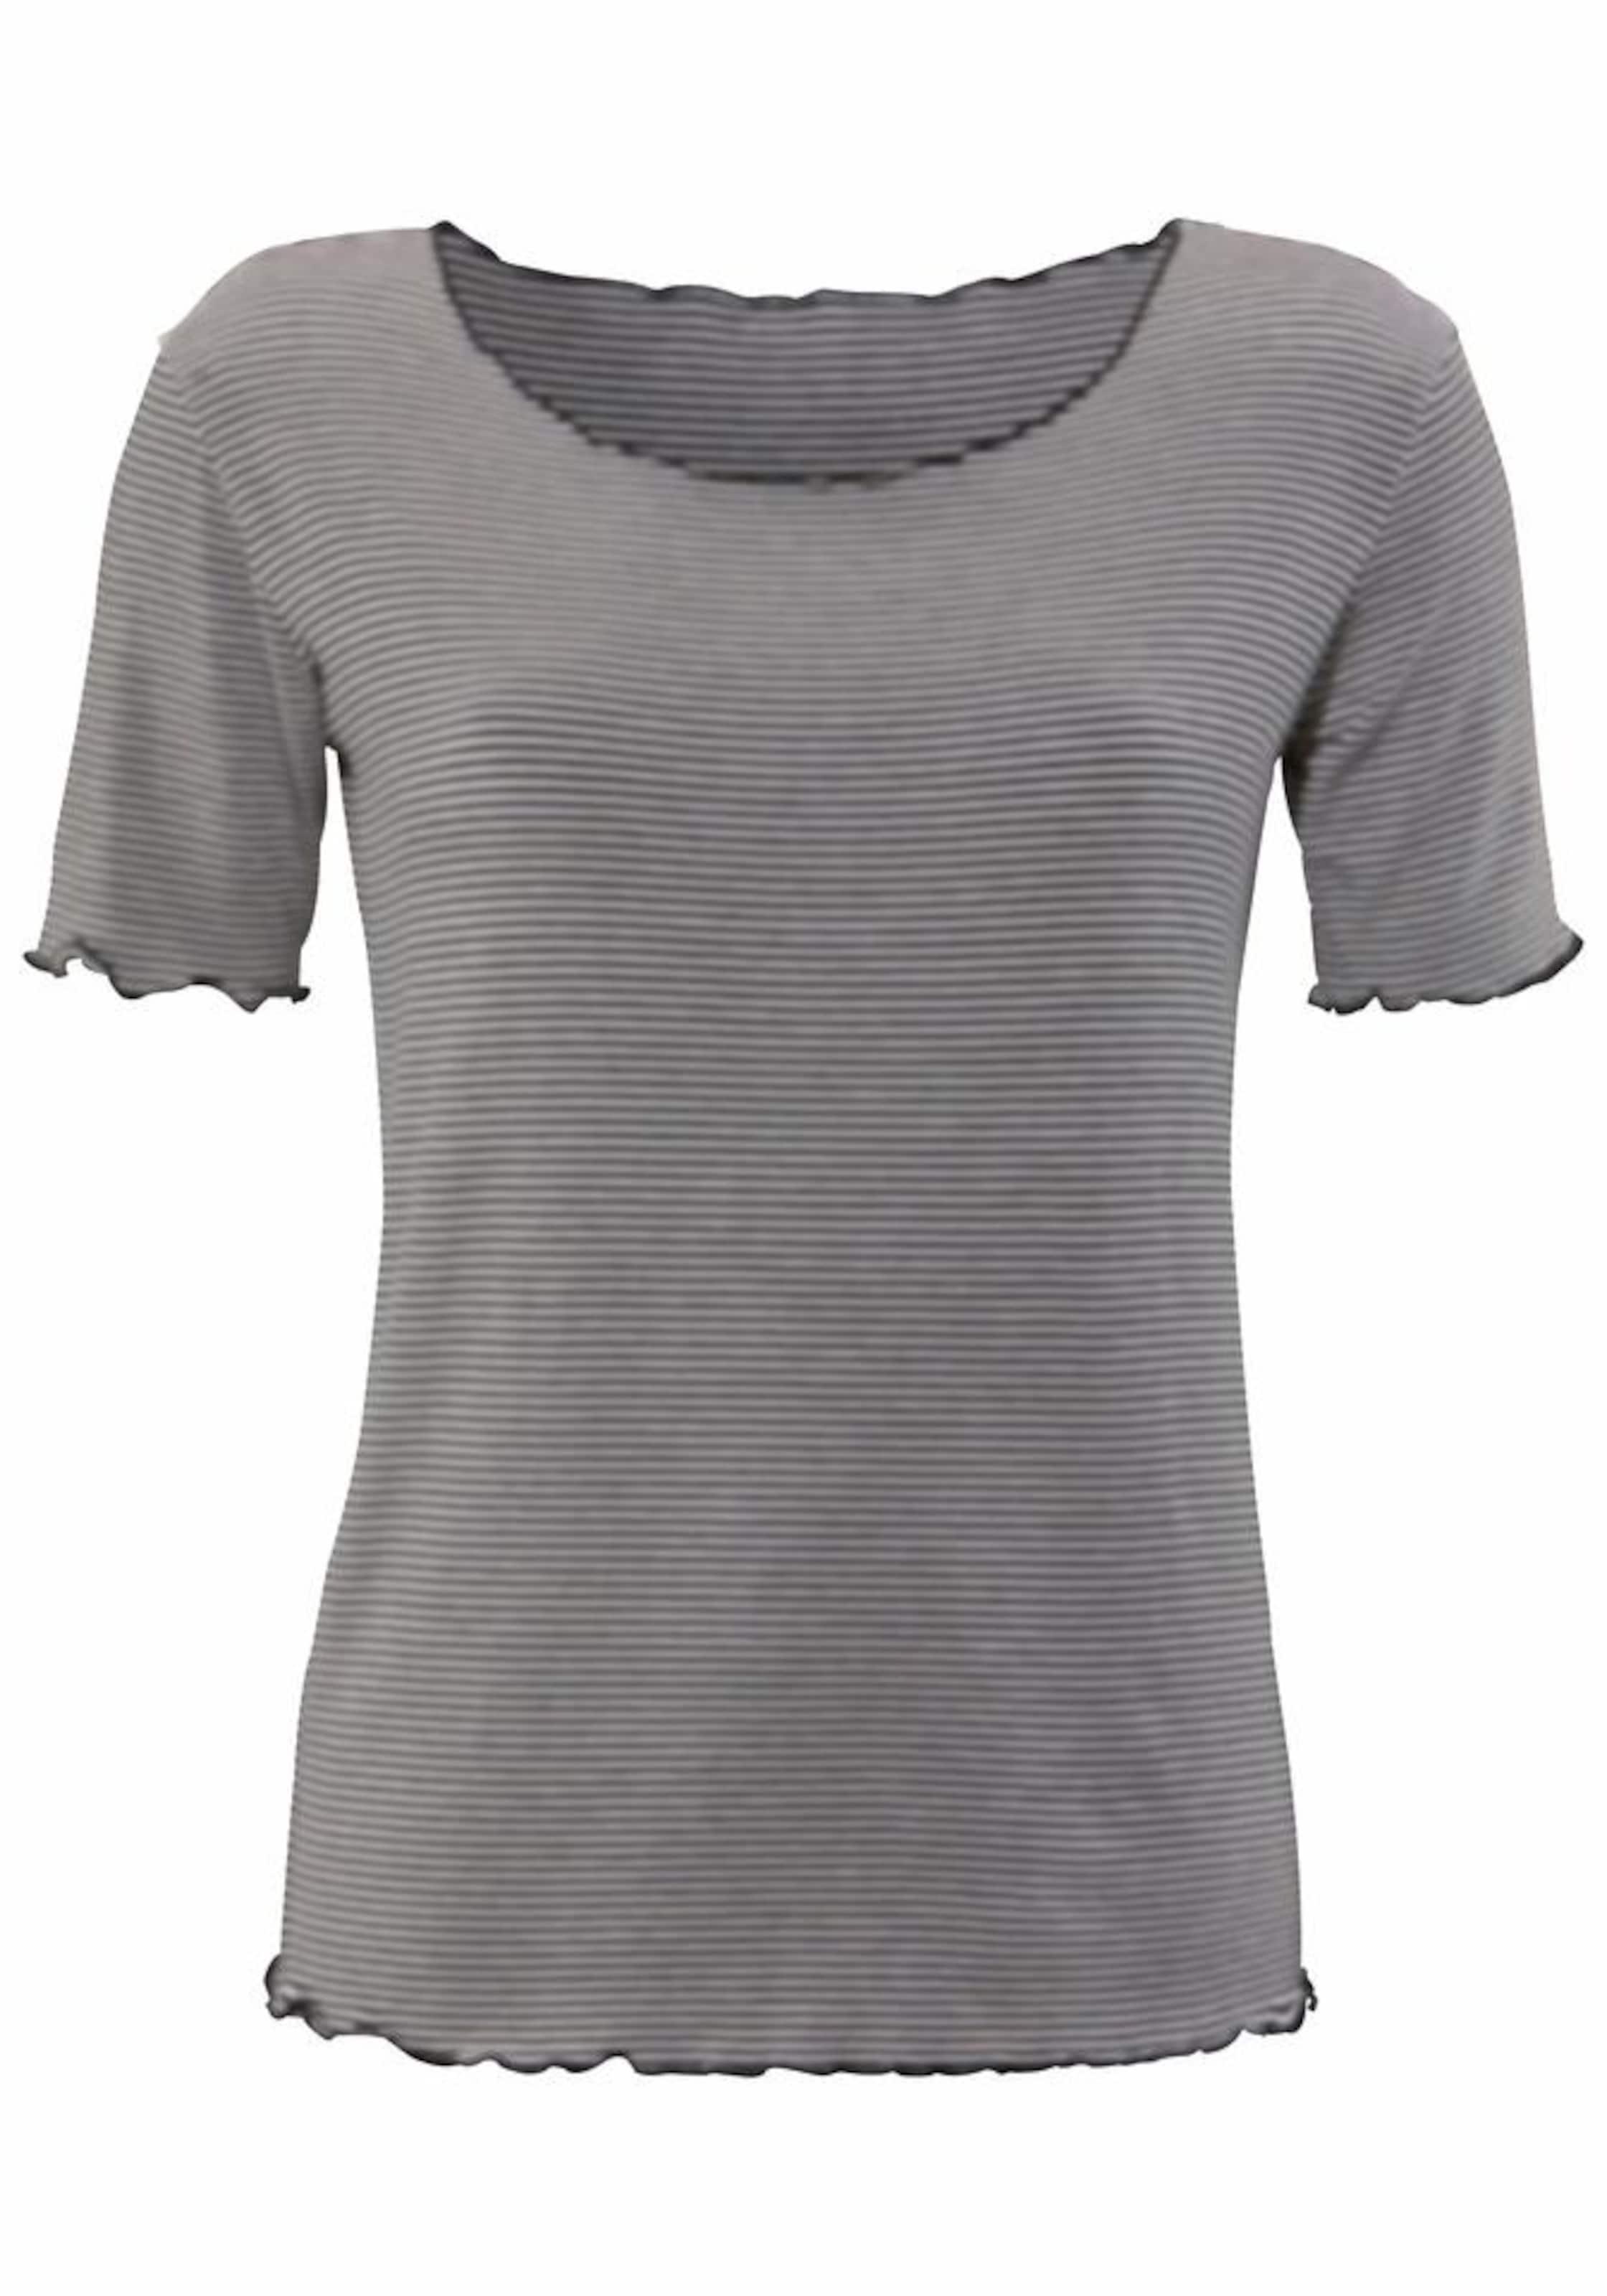 Billig Verkauf Auslass LASCANA T-Shirt Billig Wirklich JrpvR